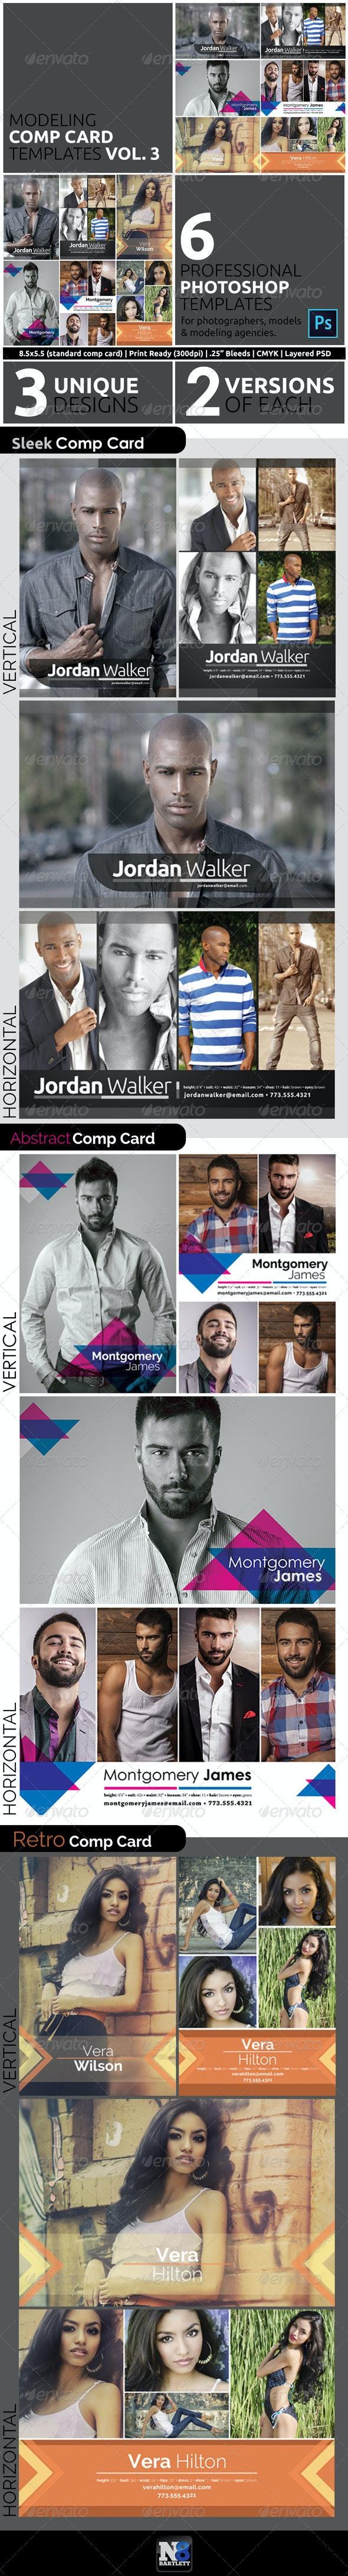 Model Comp Card Template Kit Vol. 3 - Miscellaneous Print Templates